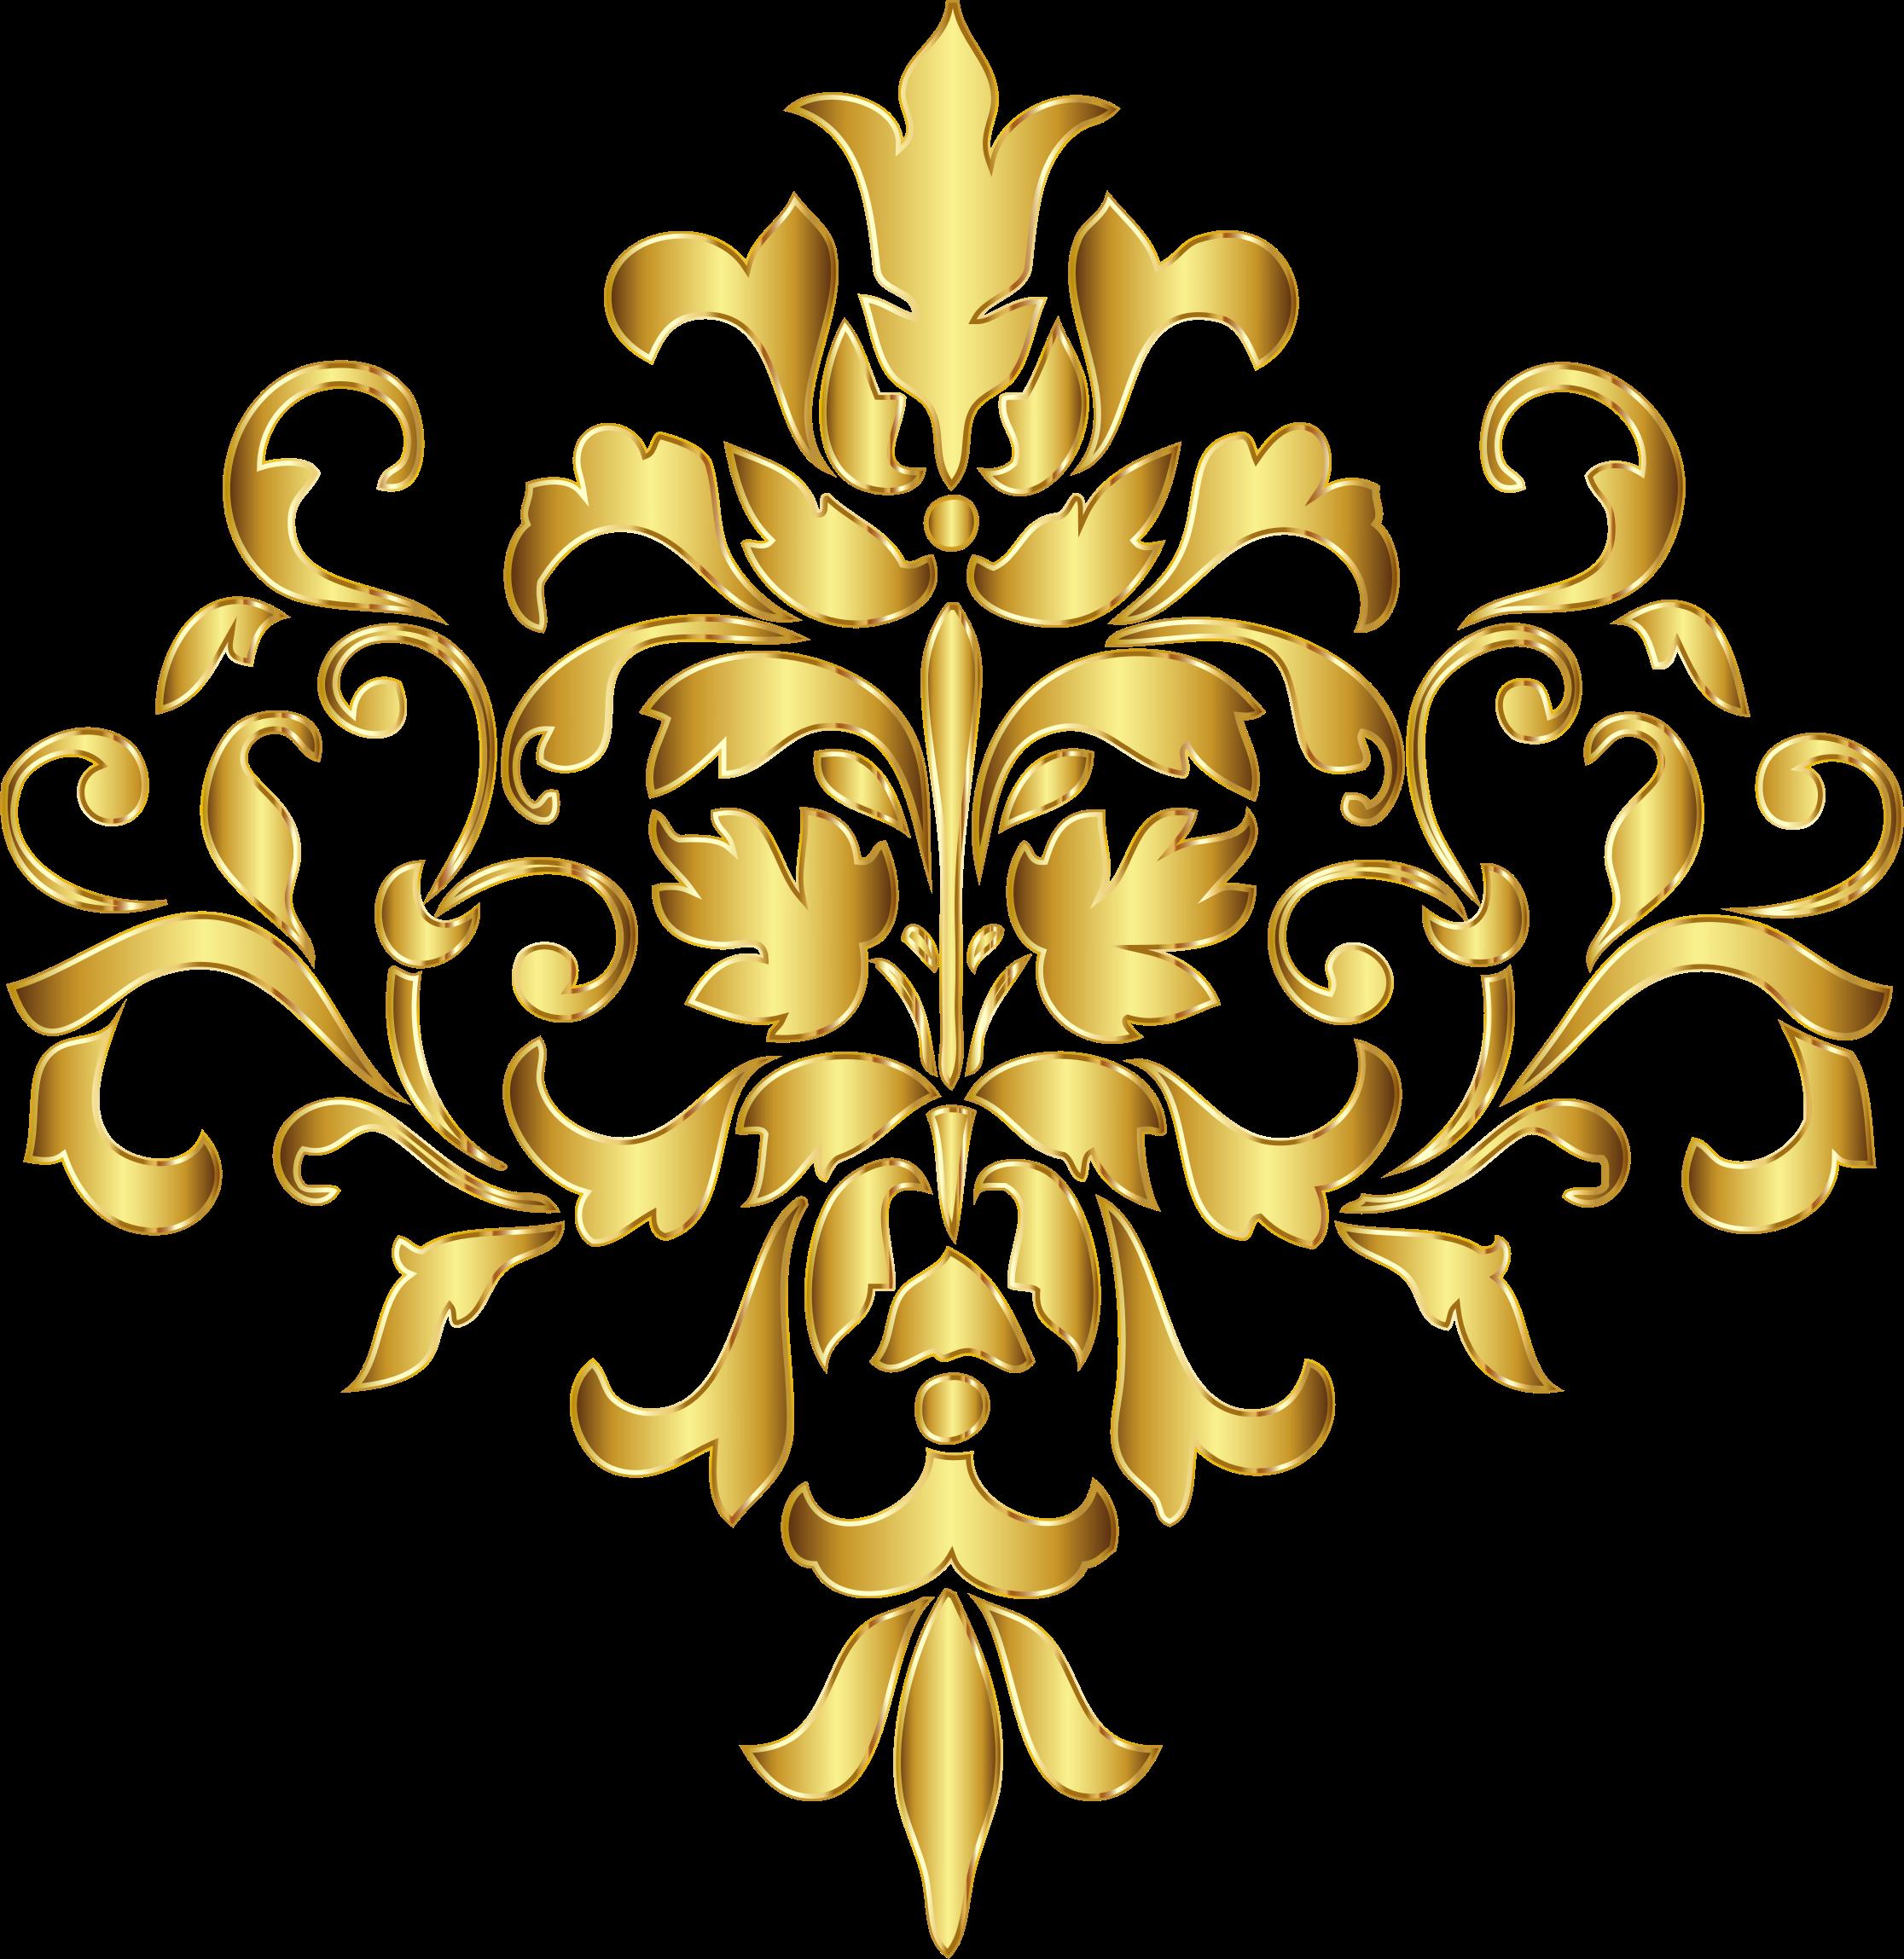 Free Gold Design Cliparts, Download Free Clip Art, Free Clip.